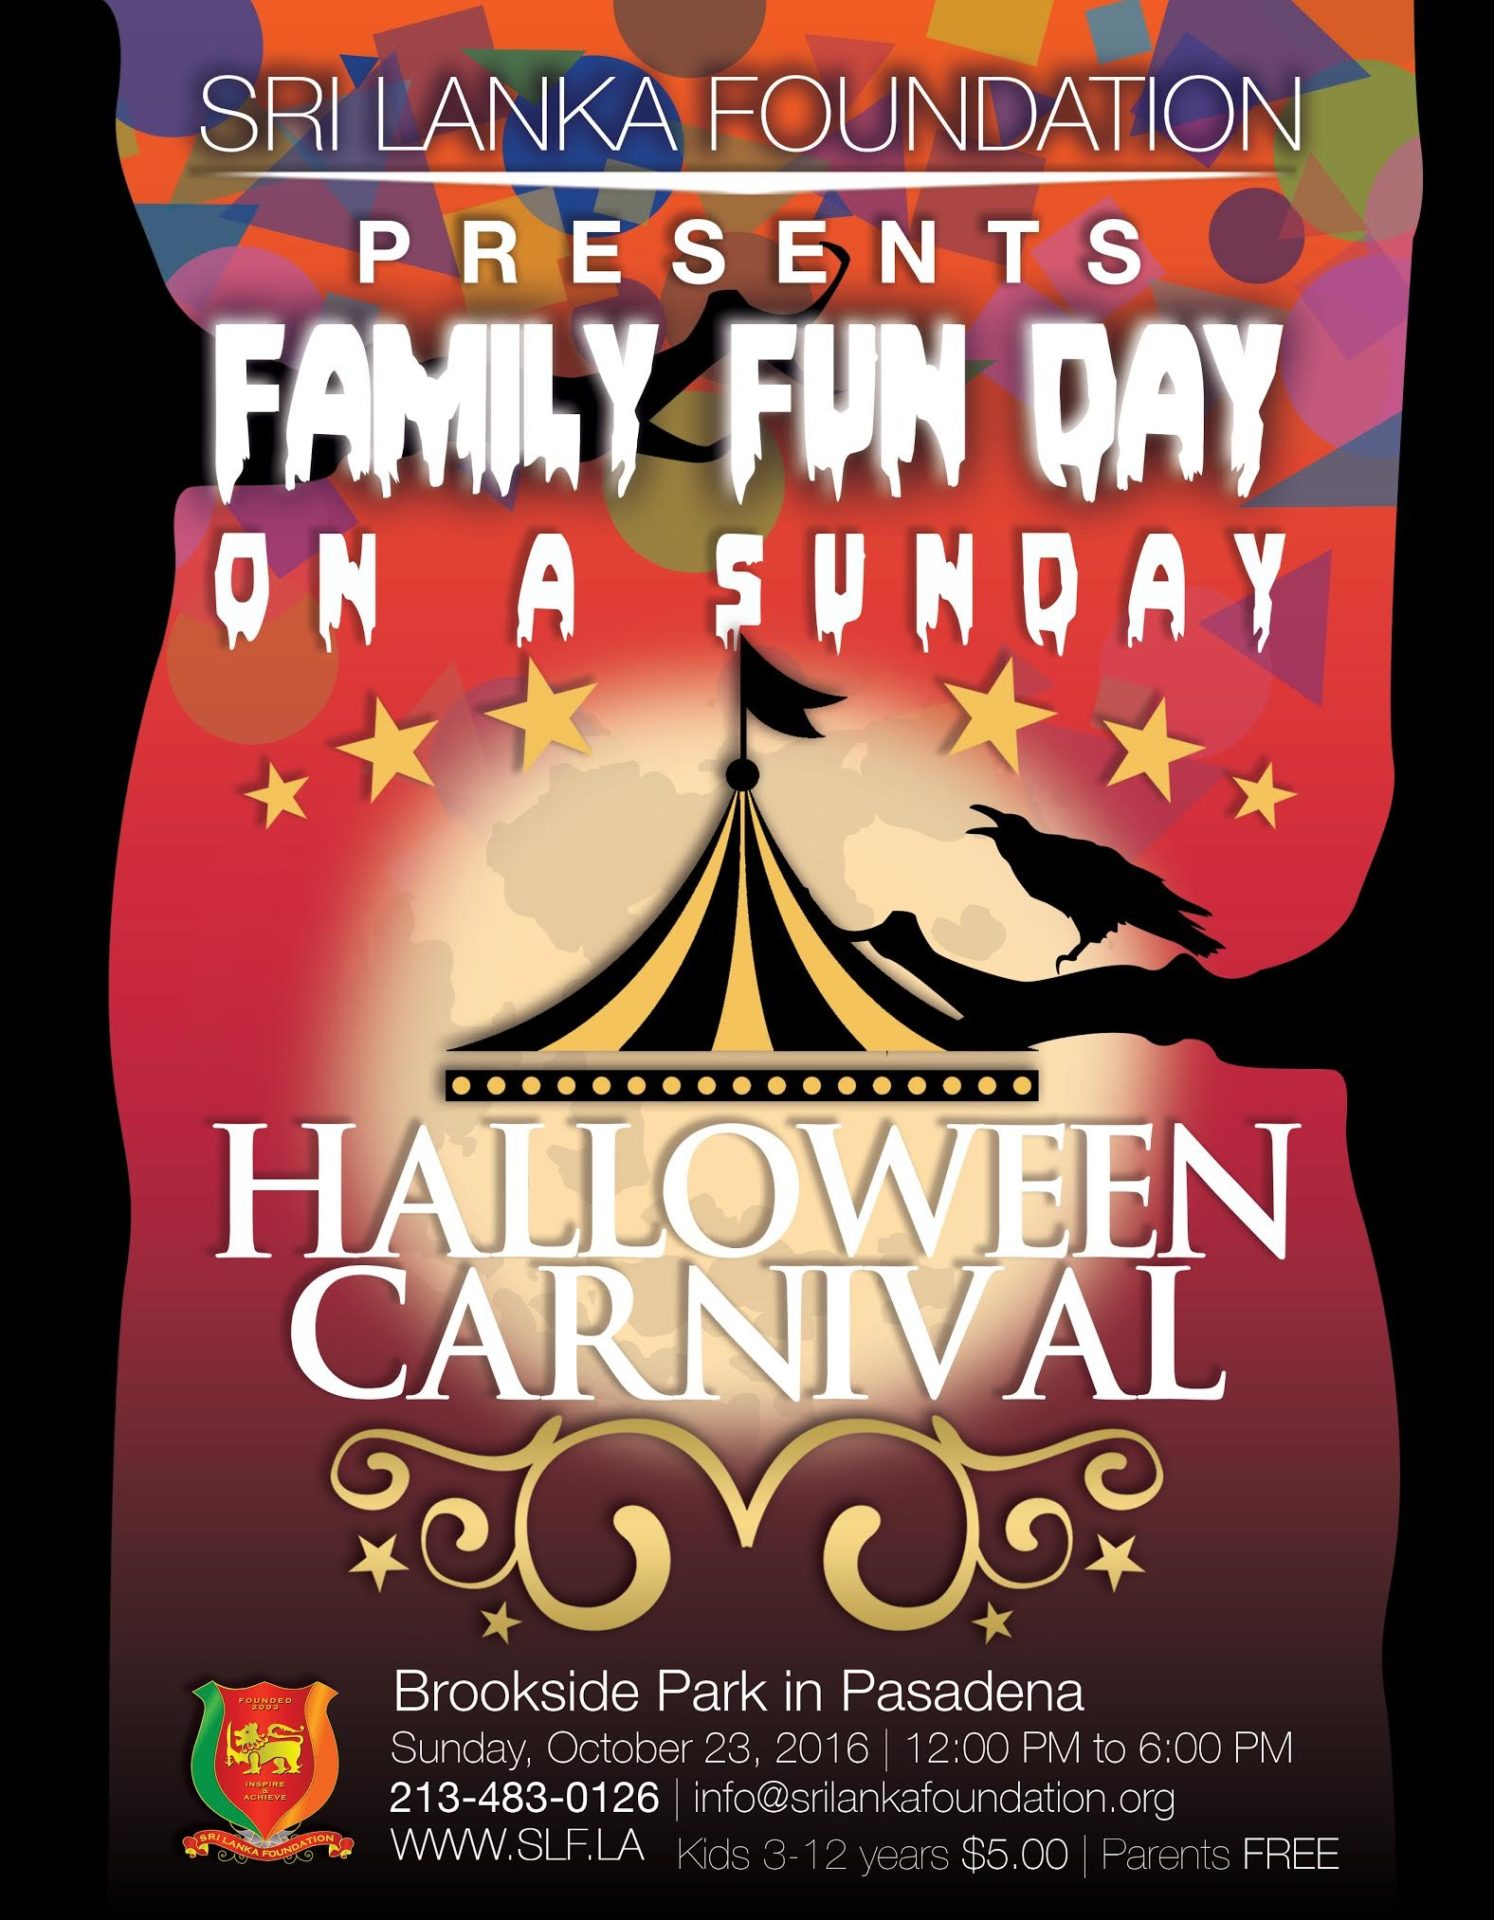 slf family fun day on a sunday halloween carnival   srilanka foundation